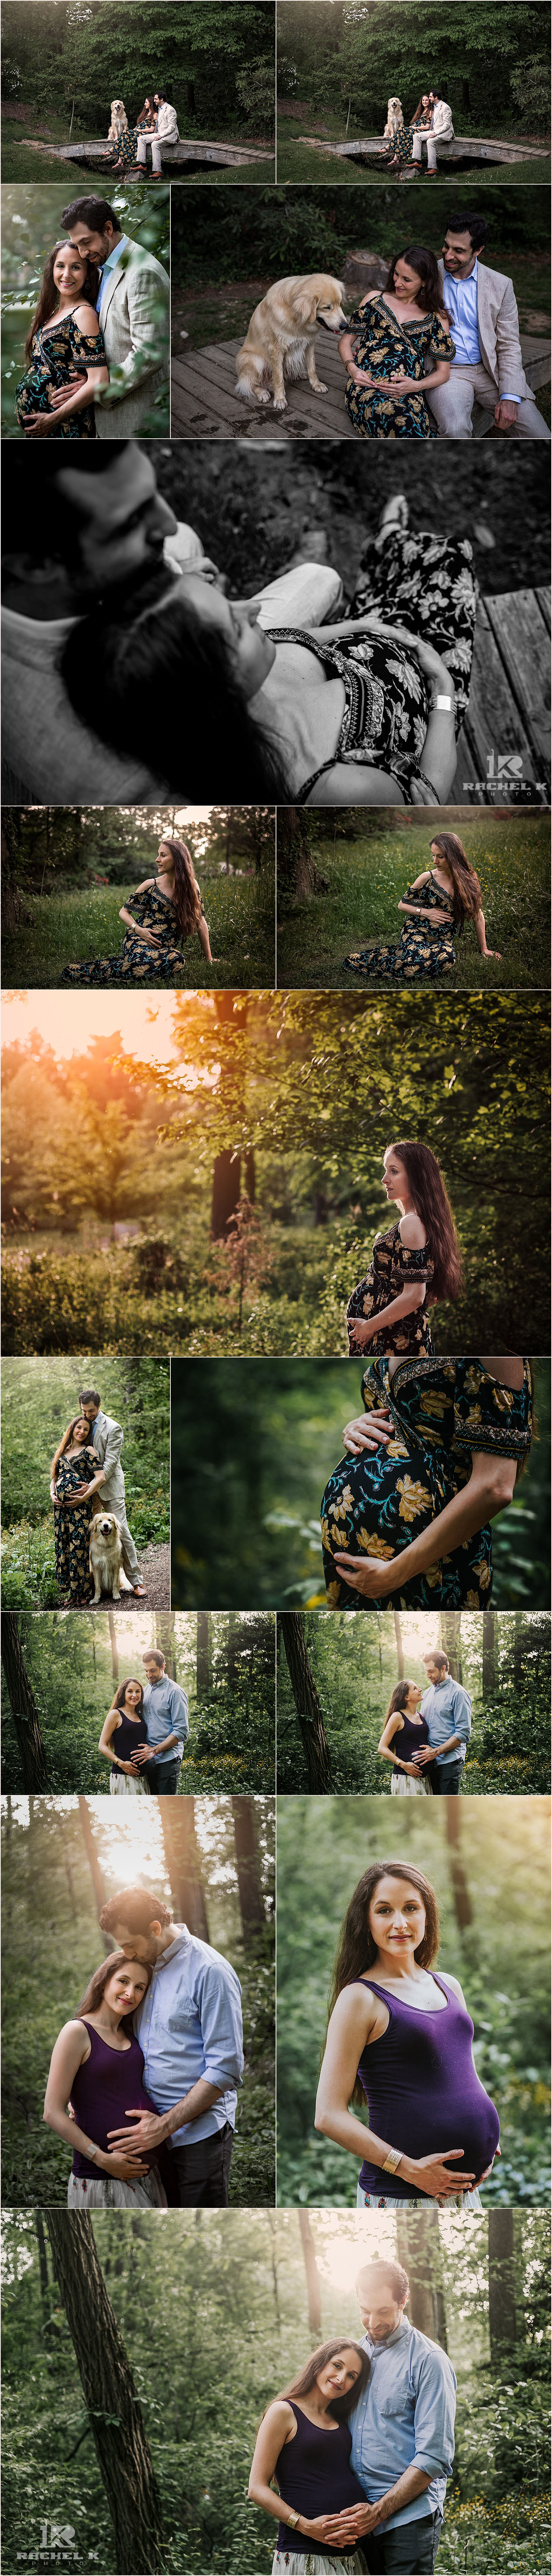 Green Springs Gardens Alexandria maternity session by Rachel K Photo